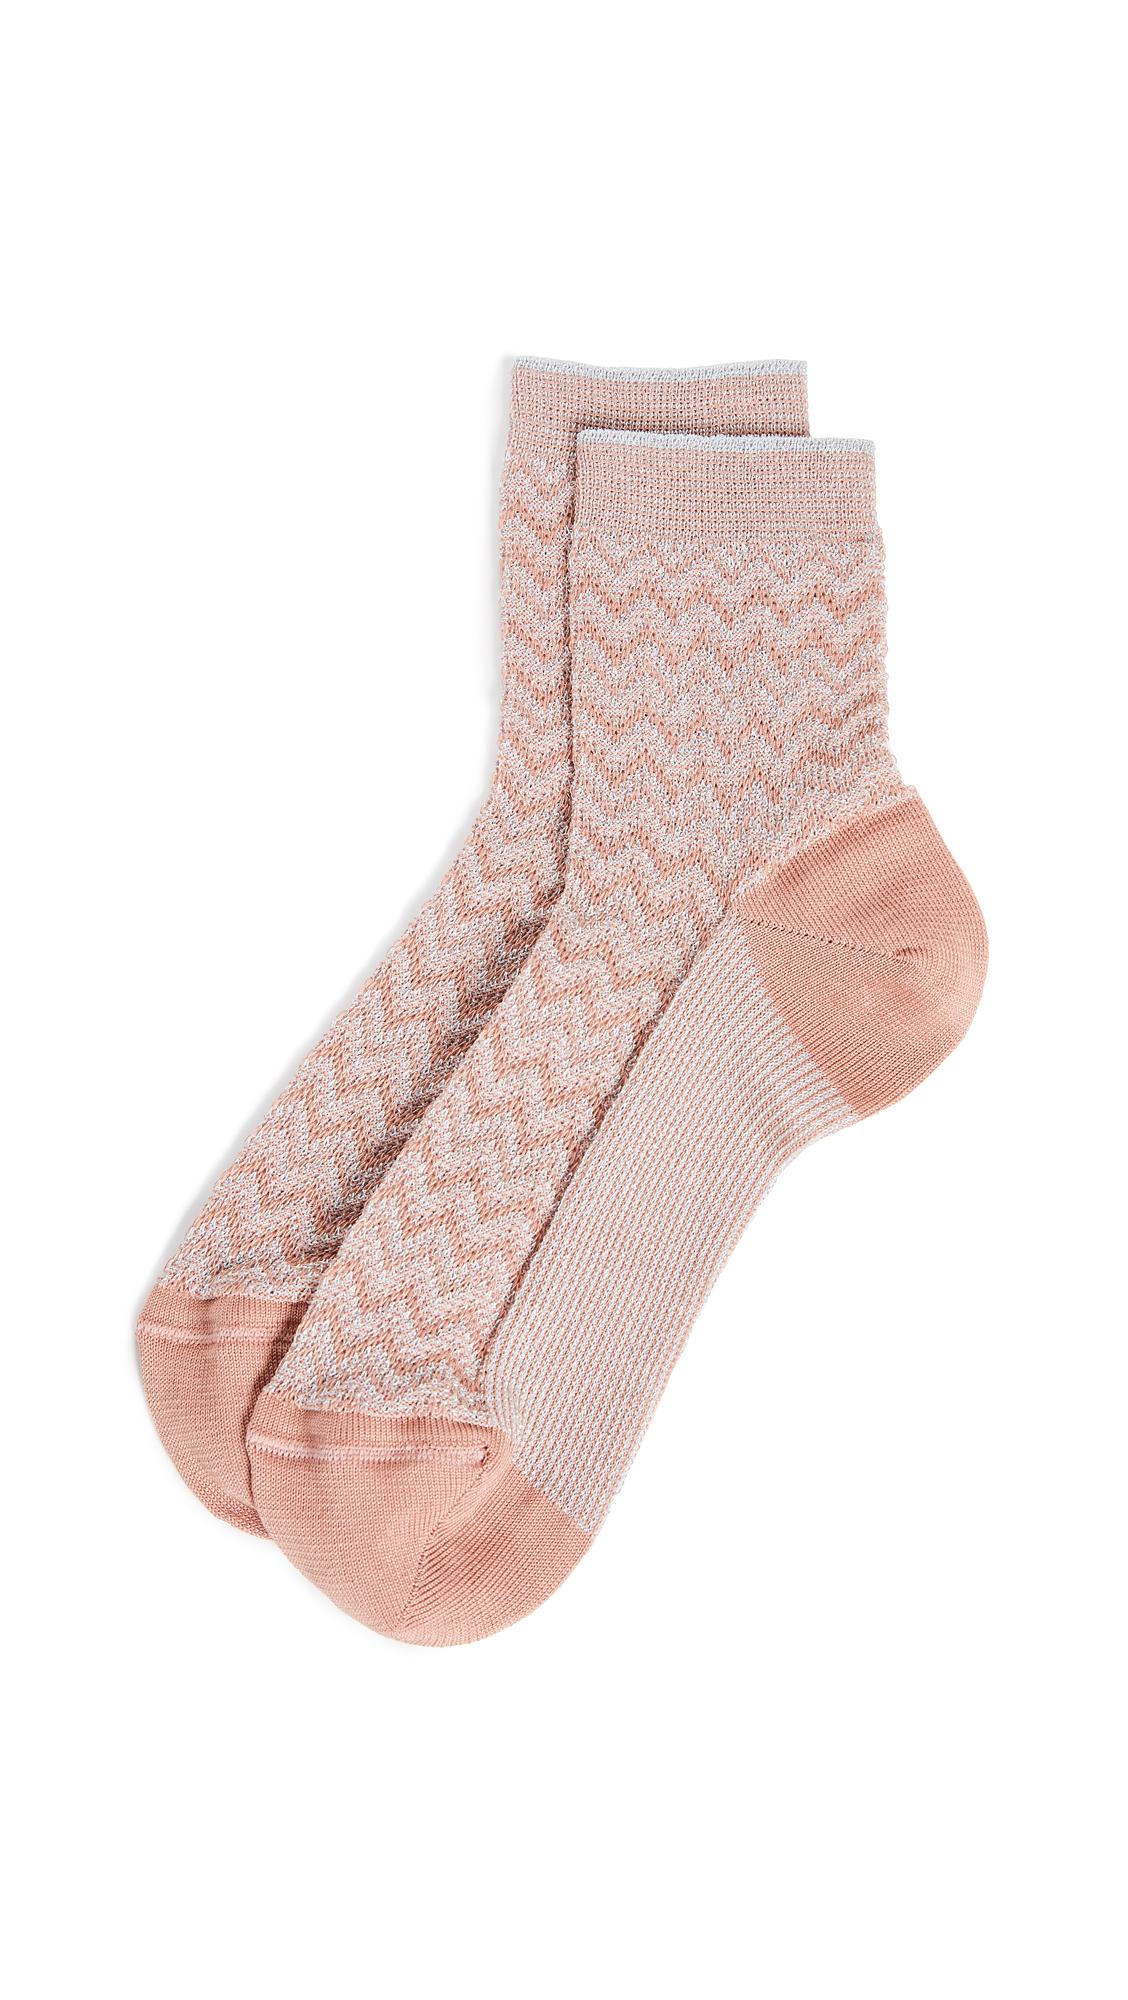 Missoni Short Socks - Pink